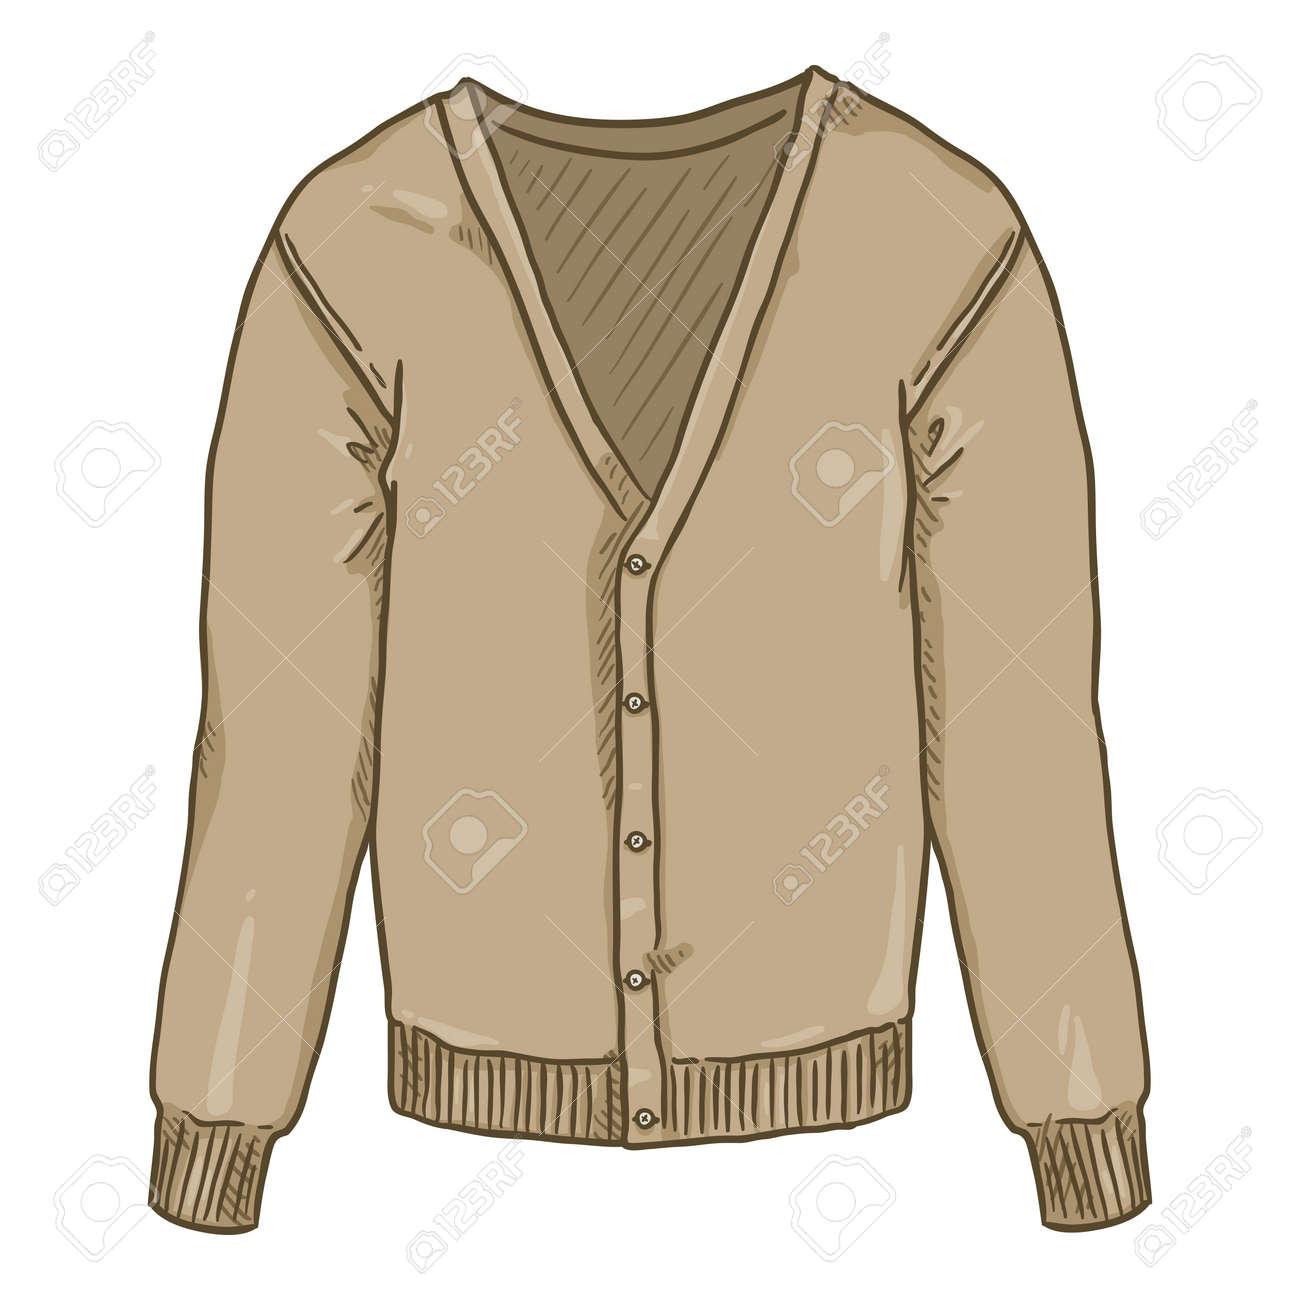 Brown Cardigan on White Background. Vector Cartoon Illustration - 169663664